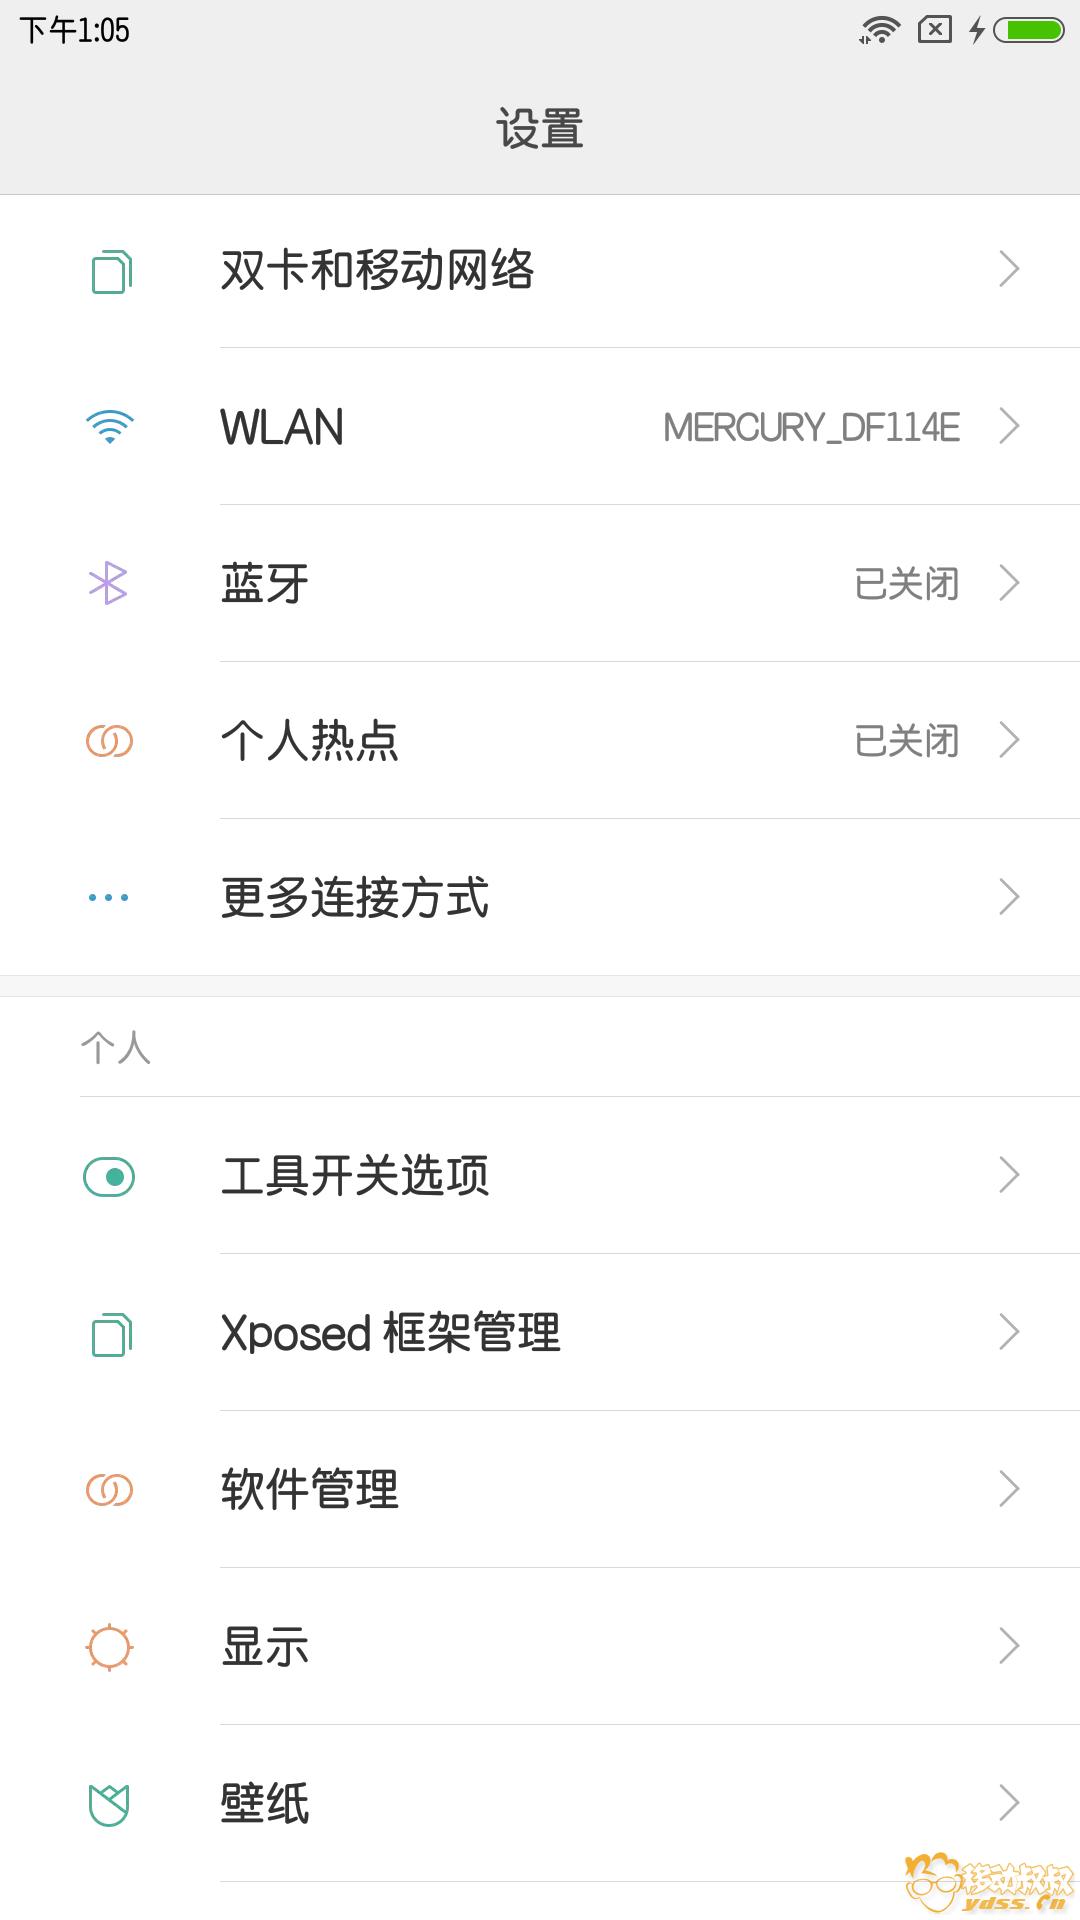 Screenshot_2018-03-13-13-05-58-621_com.android.settings.png